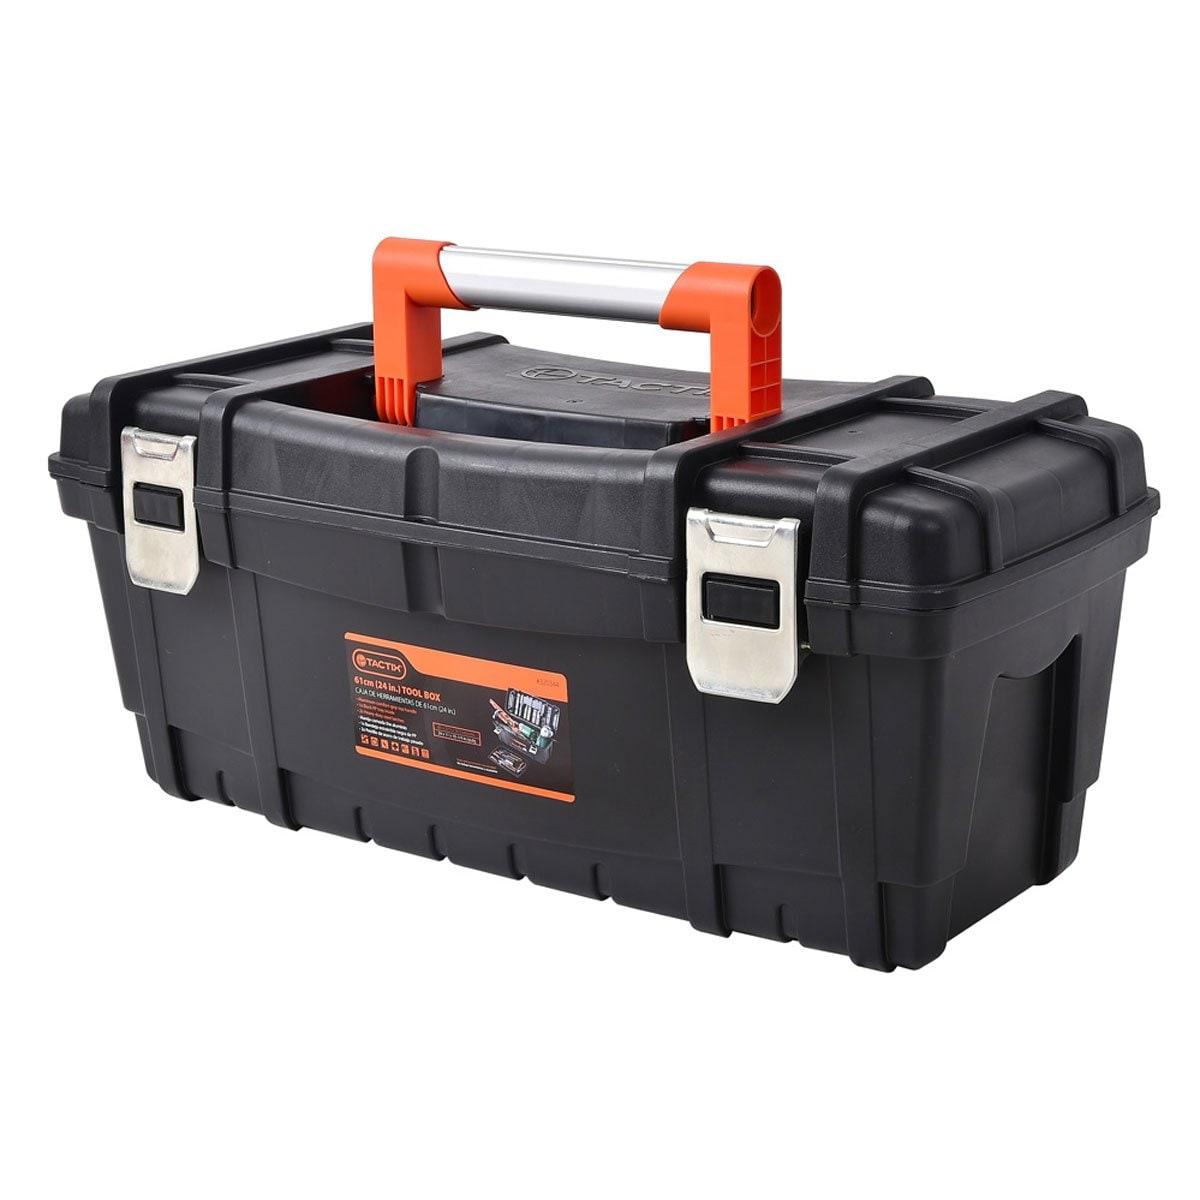 Caja Herramienta de Plástico 61 Cm (24 In) Tactix